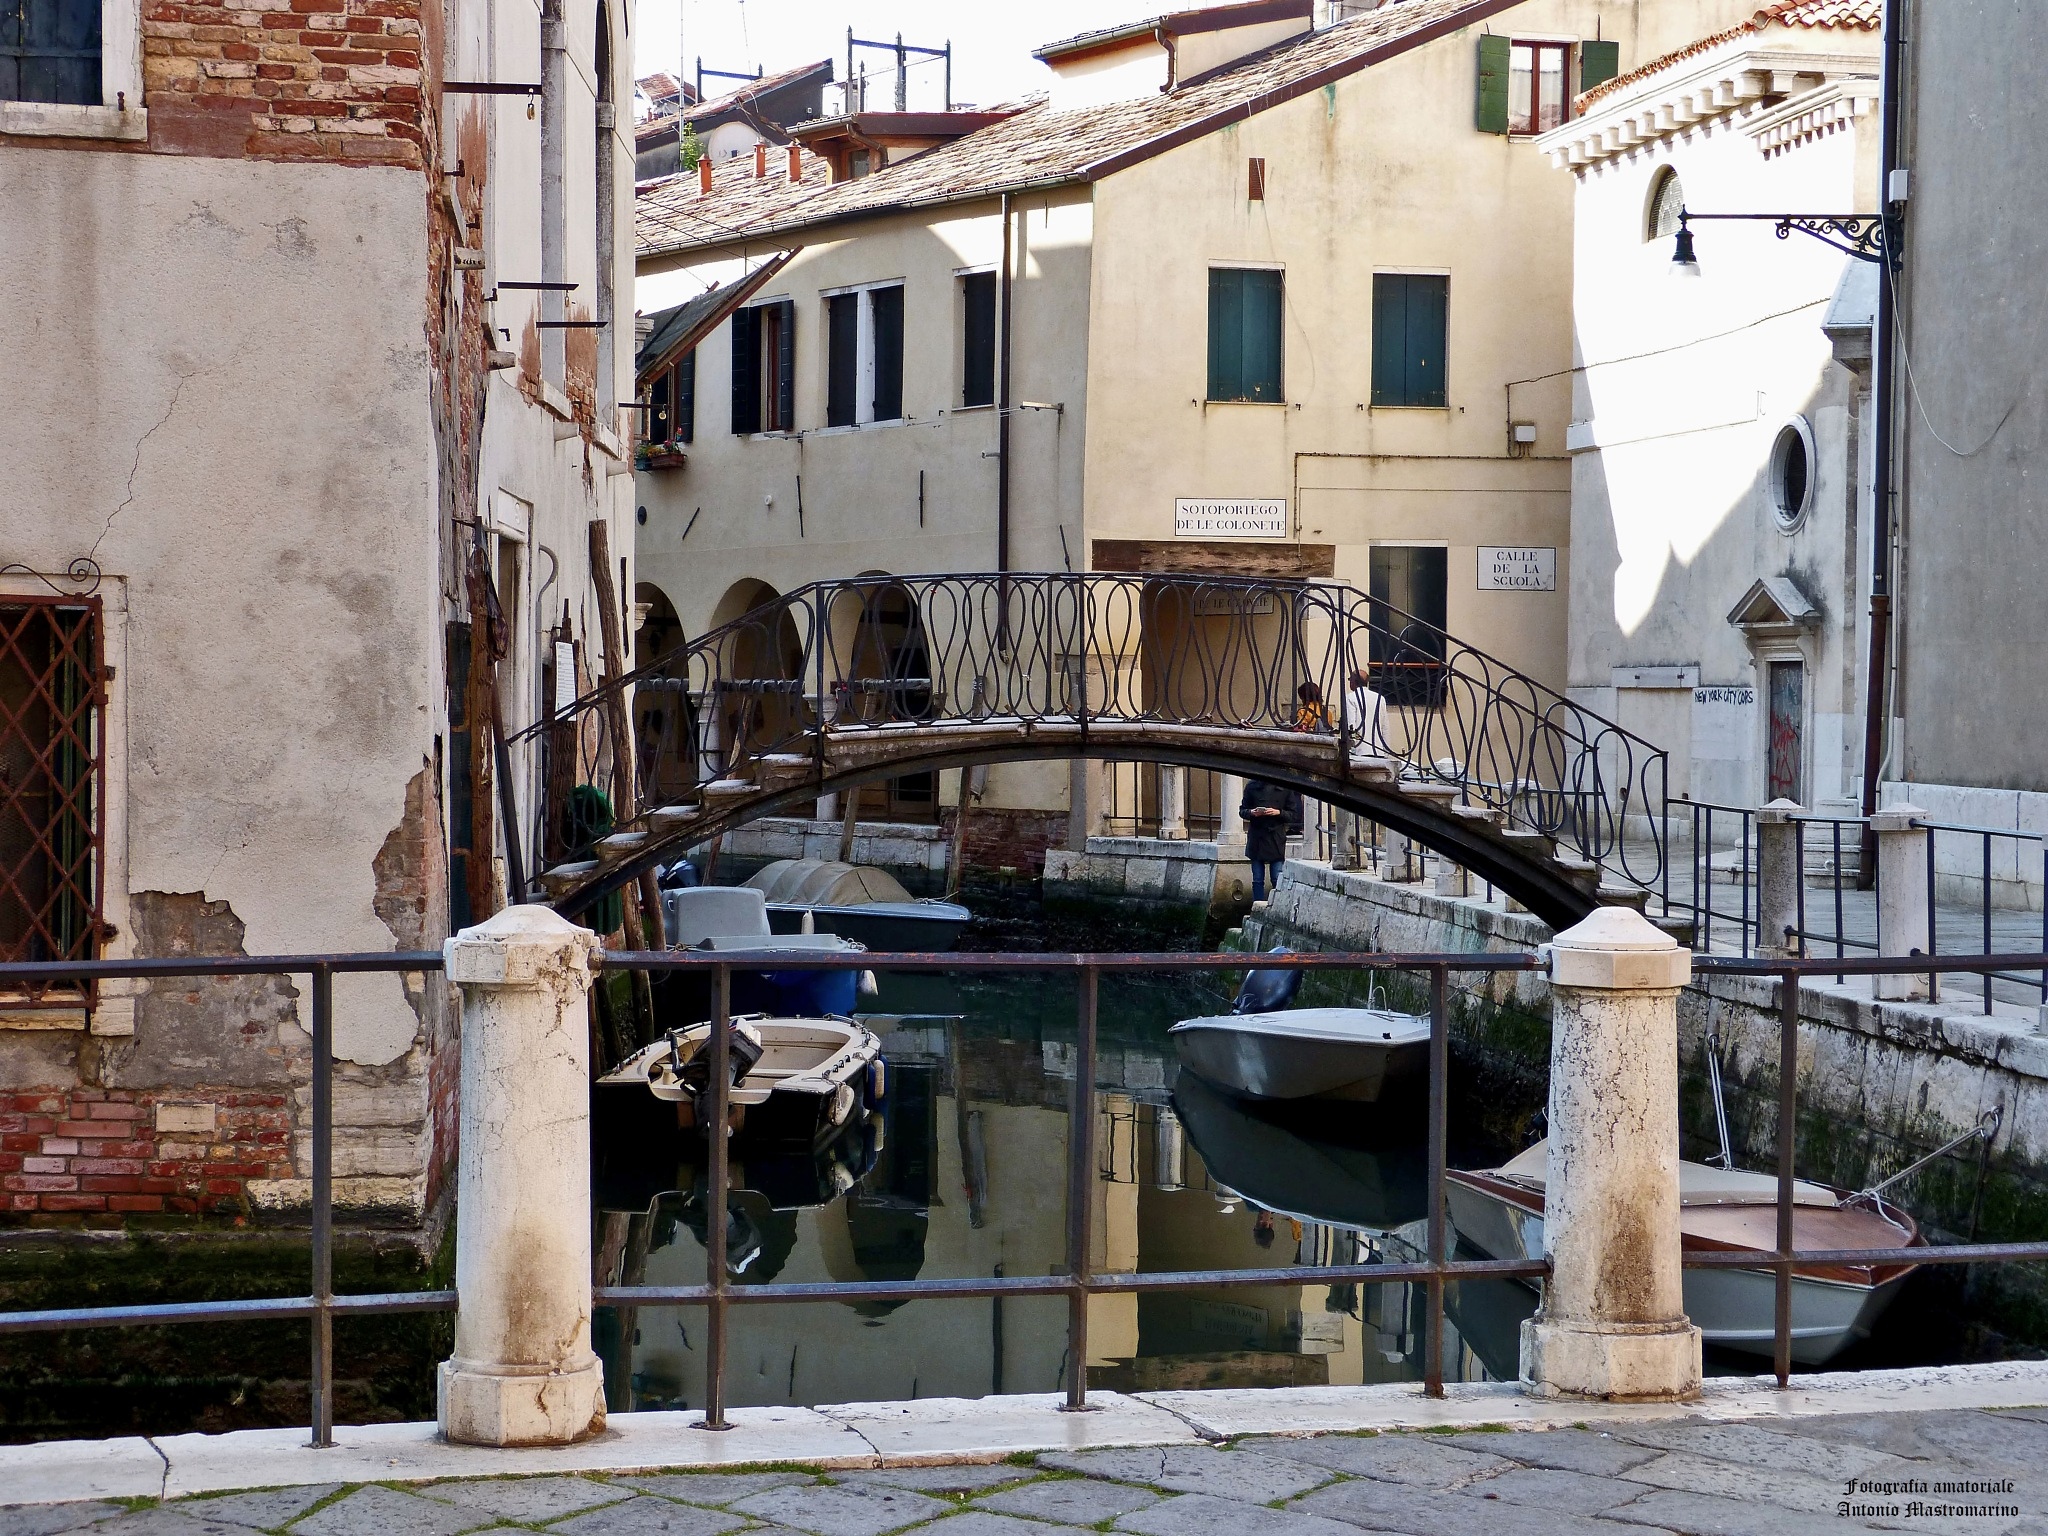 Venezia by antonio mastromarino